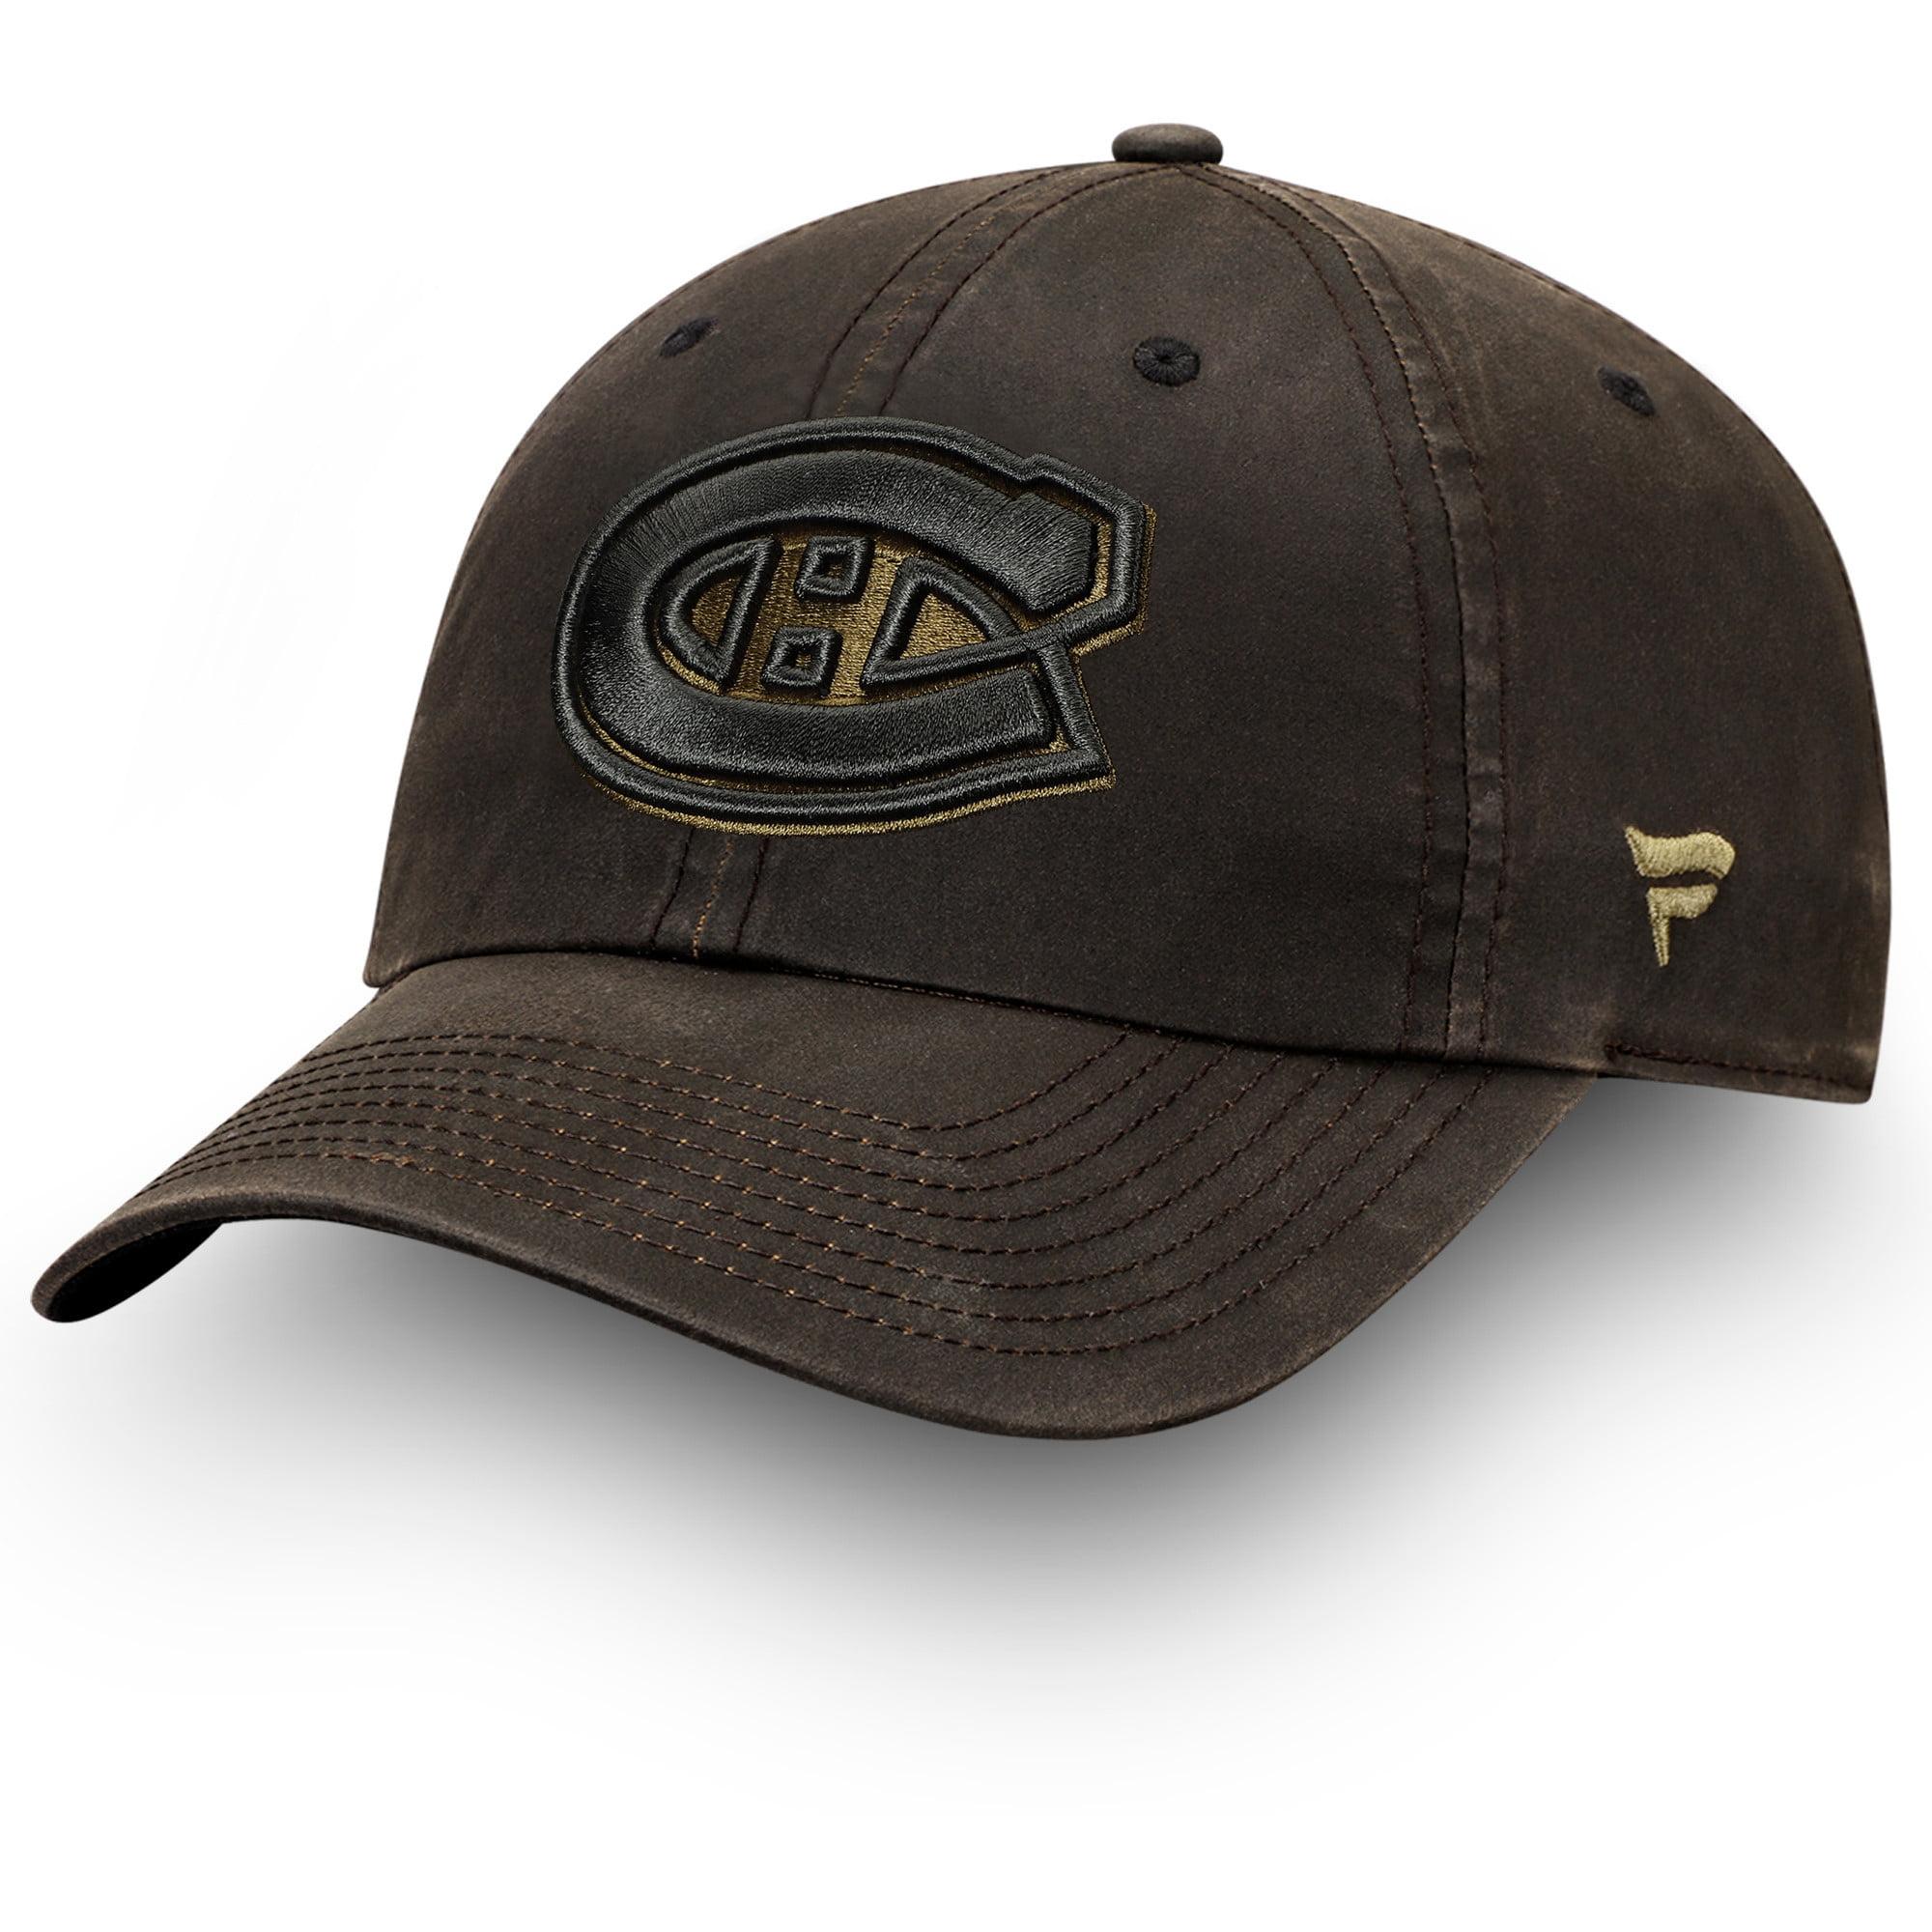 Montreal Canadiens Fanatics Branded Lux Fundamental Adjustable Hat - Brown/Olive - OSFA